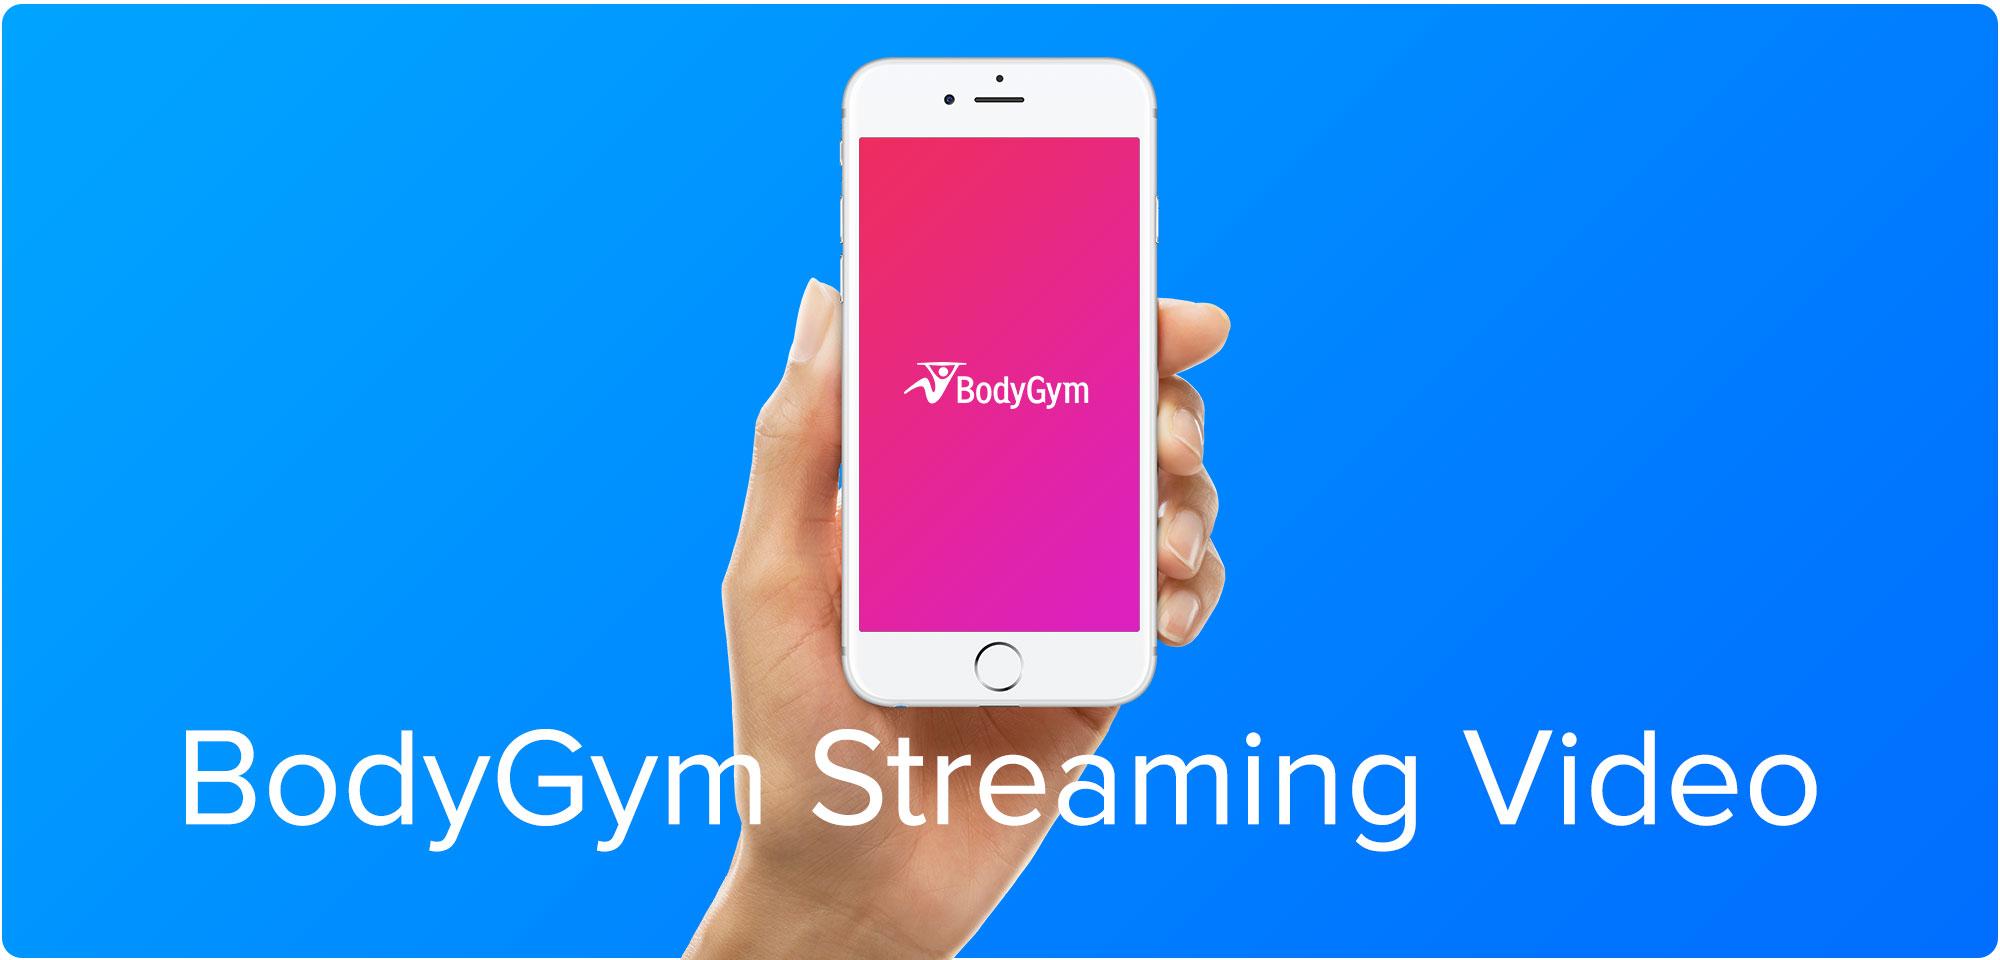 bodygym-app-download.jpg